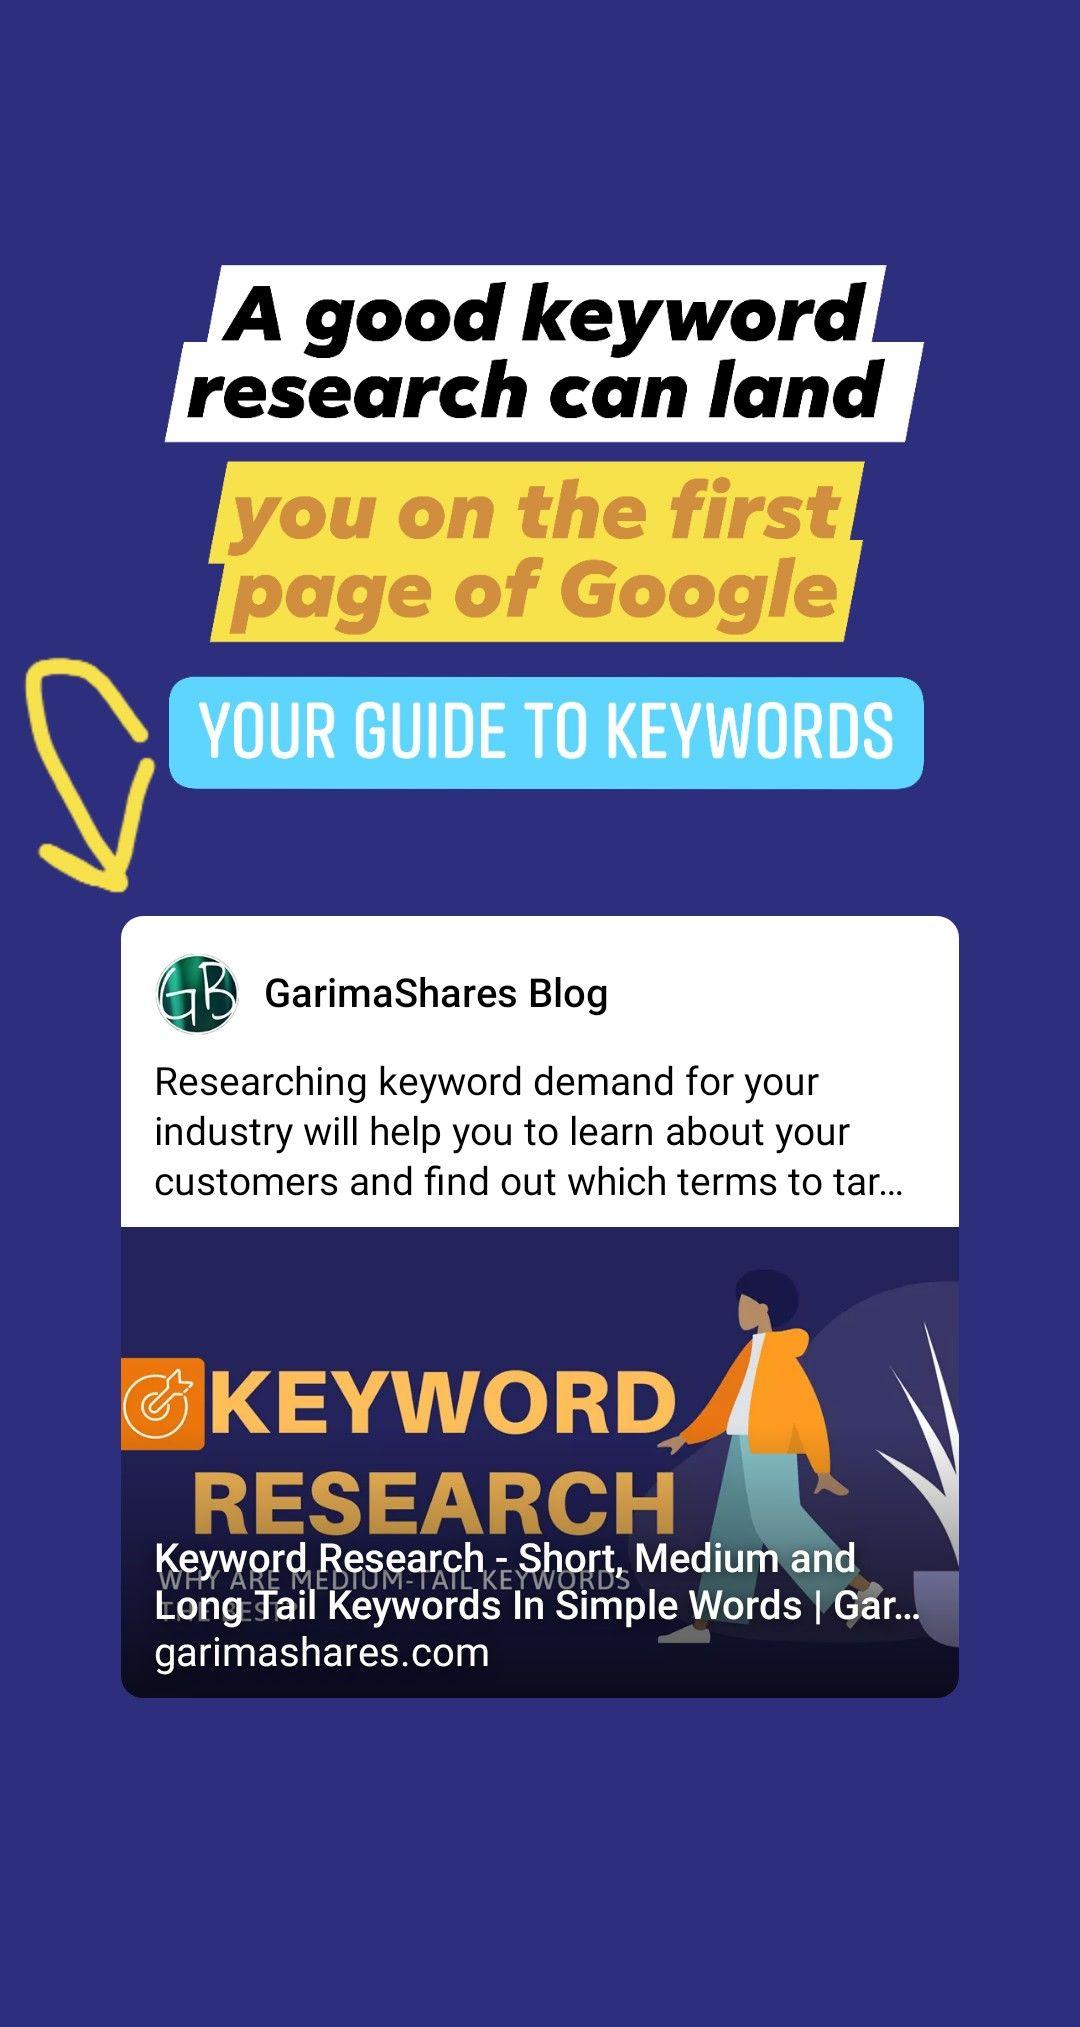 Pin by GarimaShares on Blogging Guide Blogging guide